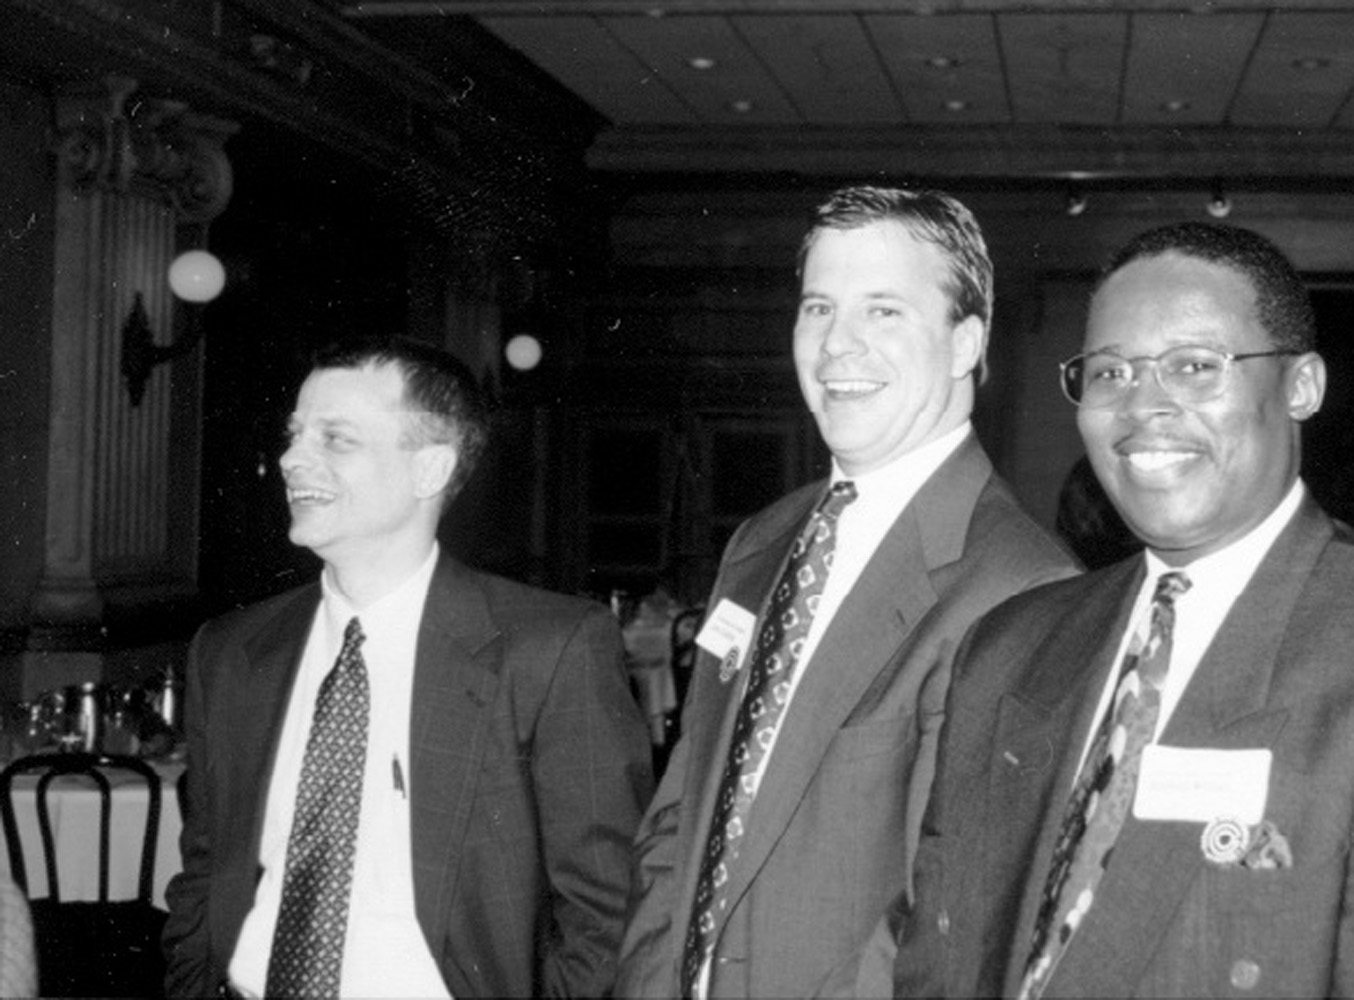 Carl Hansen and Joe Cushing at a Networking Event